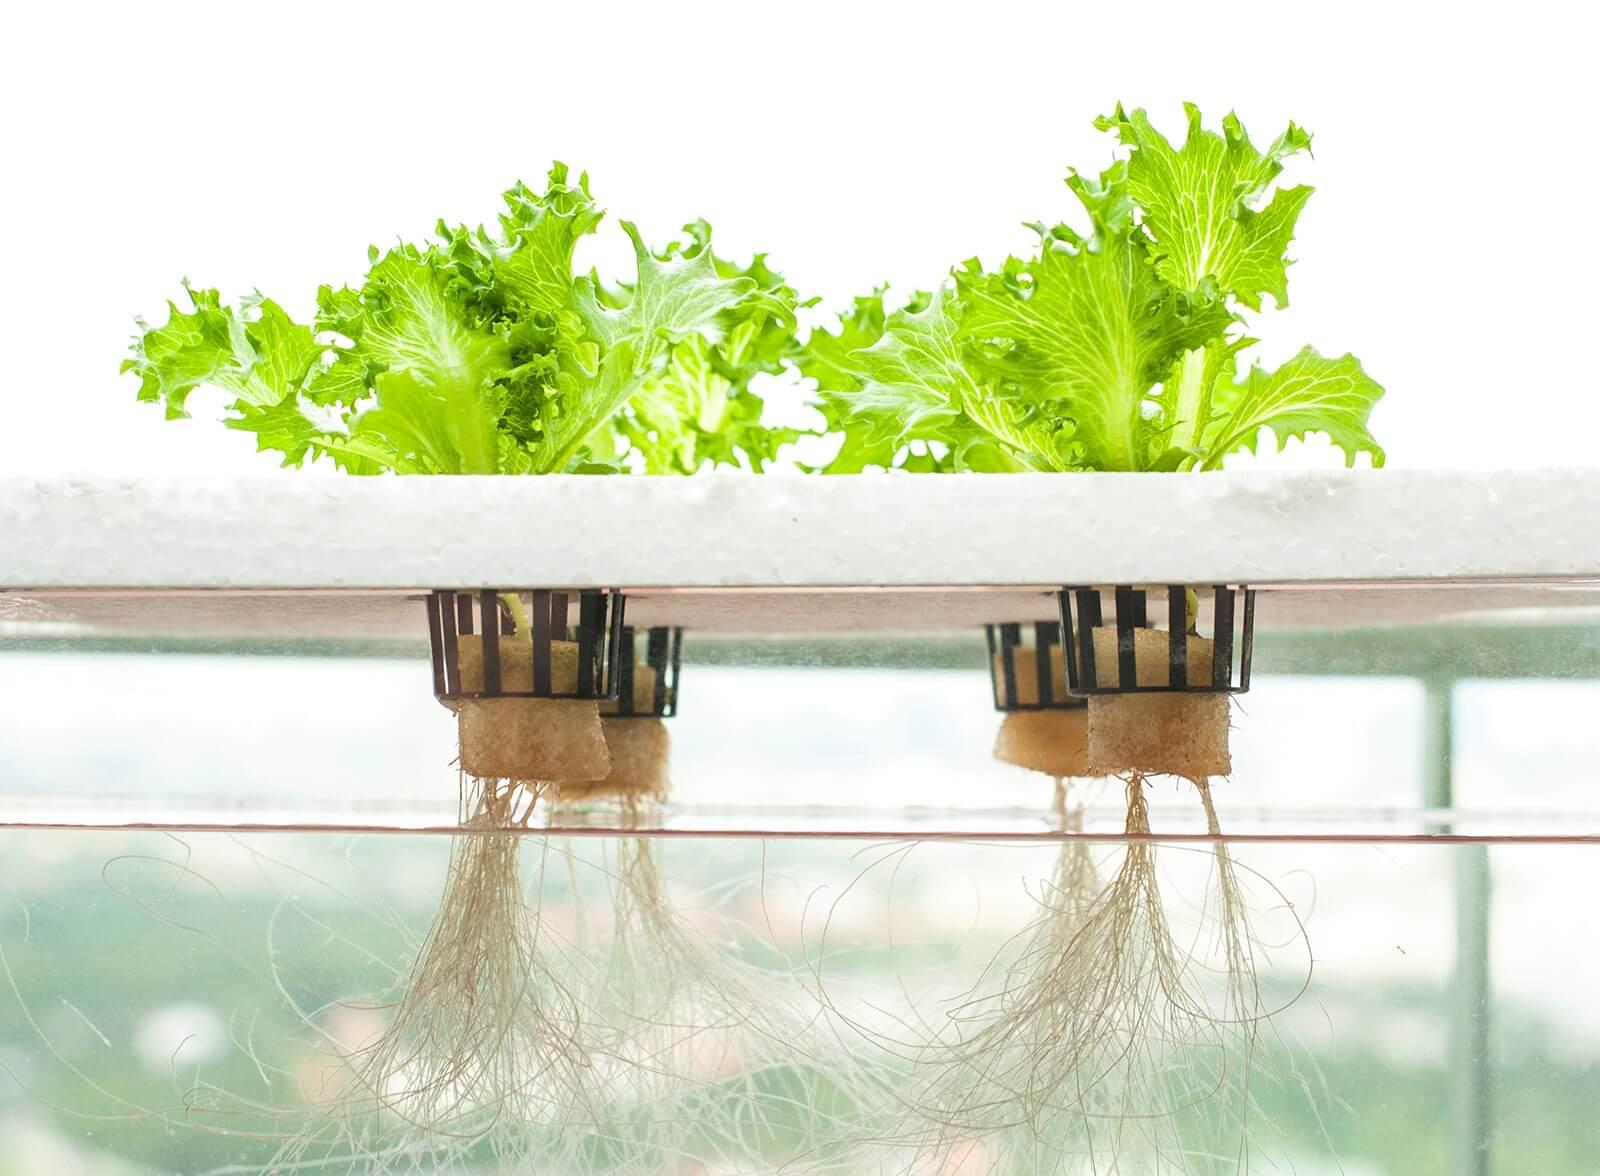 Hydroponics method of farming